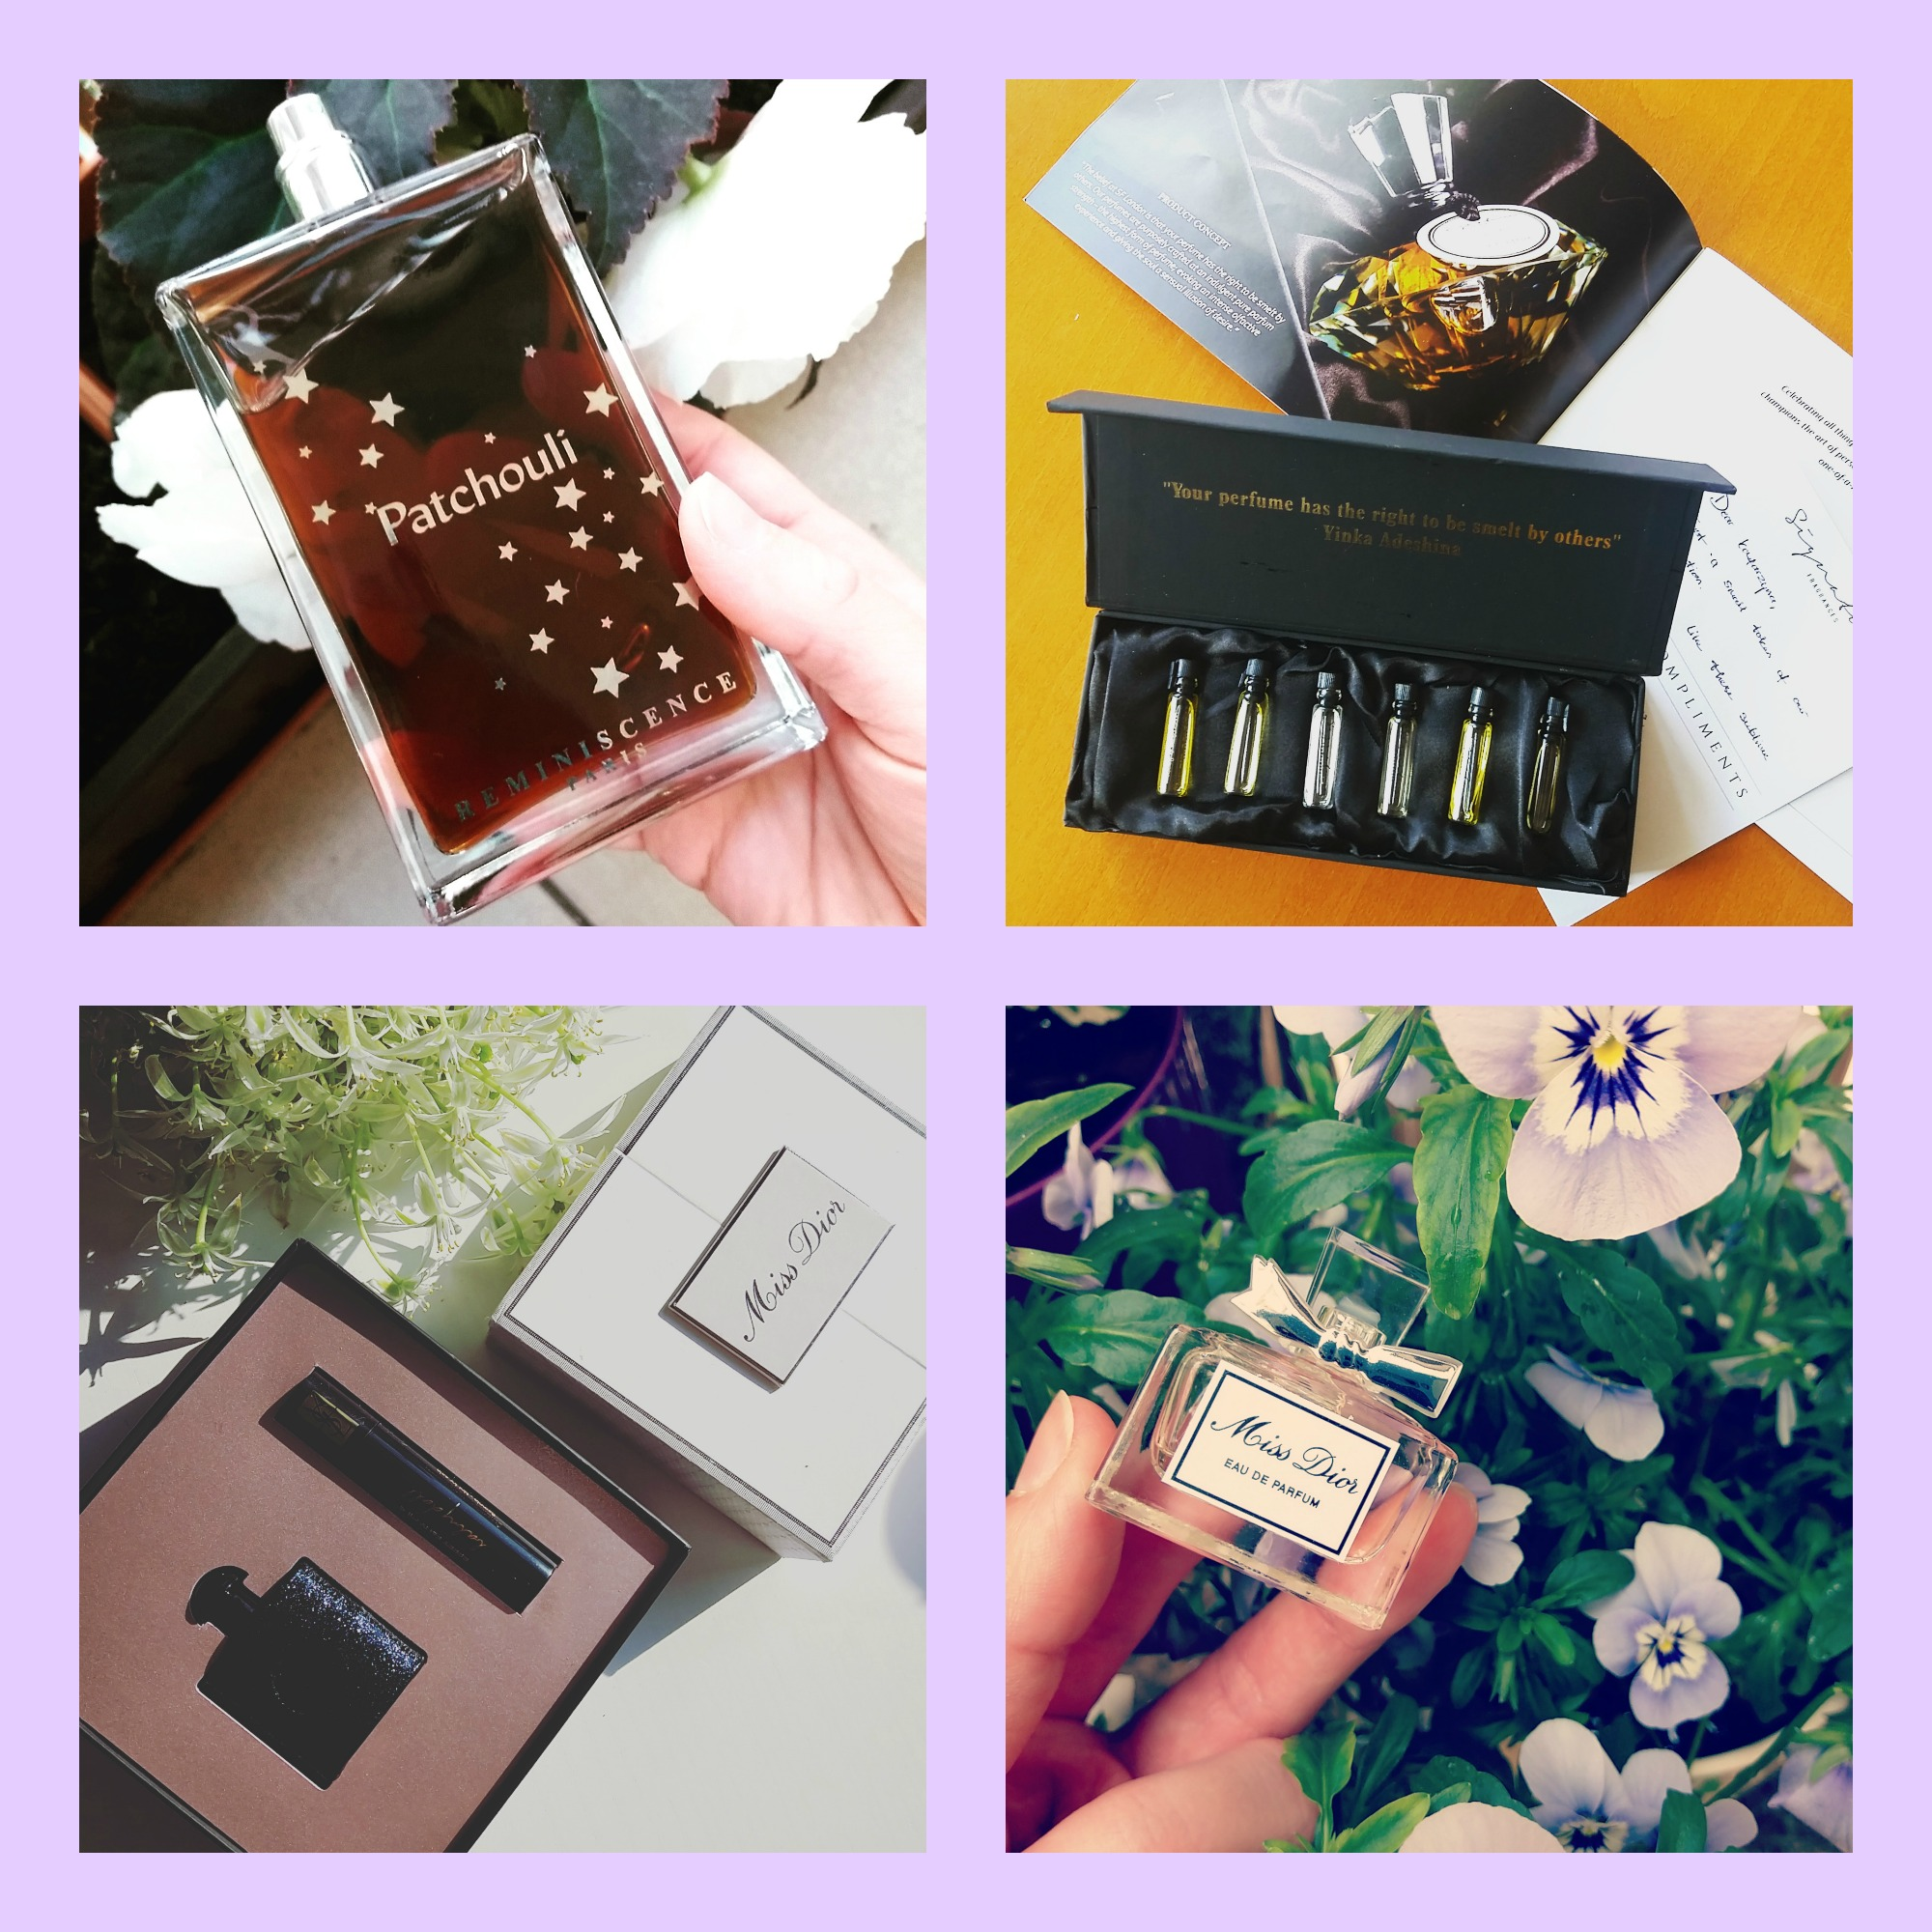 perfumy edpholiczka reminiscence dior